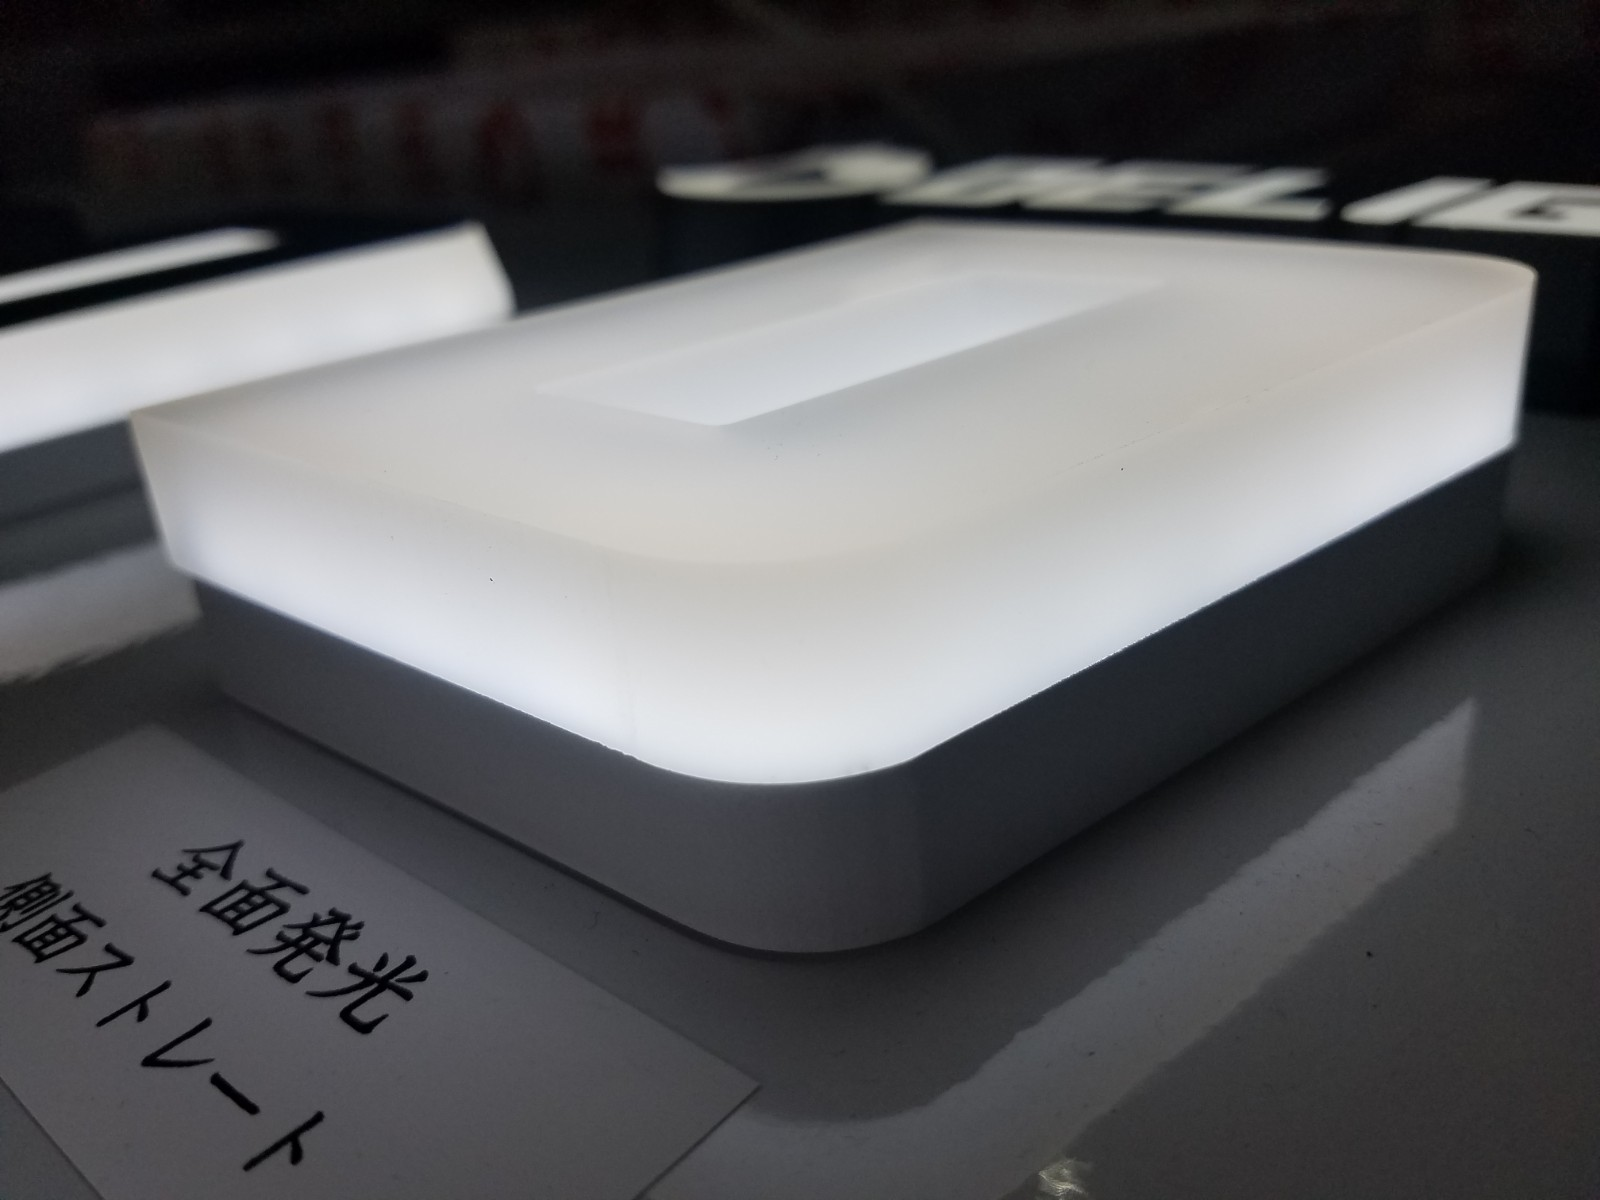 LEDサイン 全面発光 AllLit 前全体発光 DELIGHT